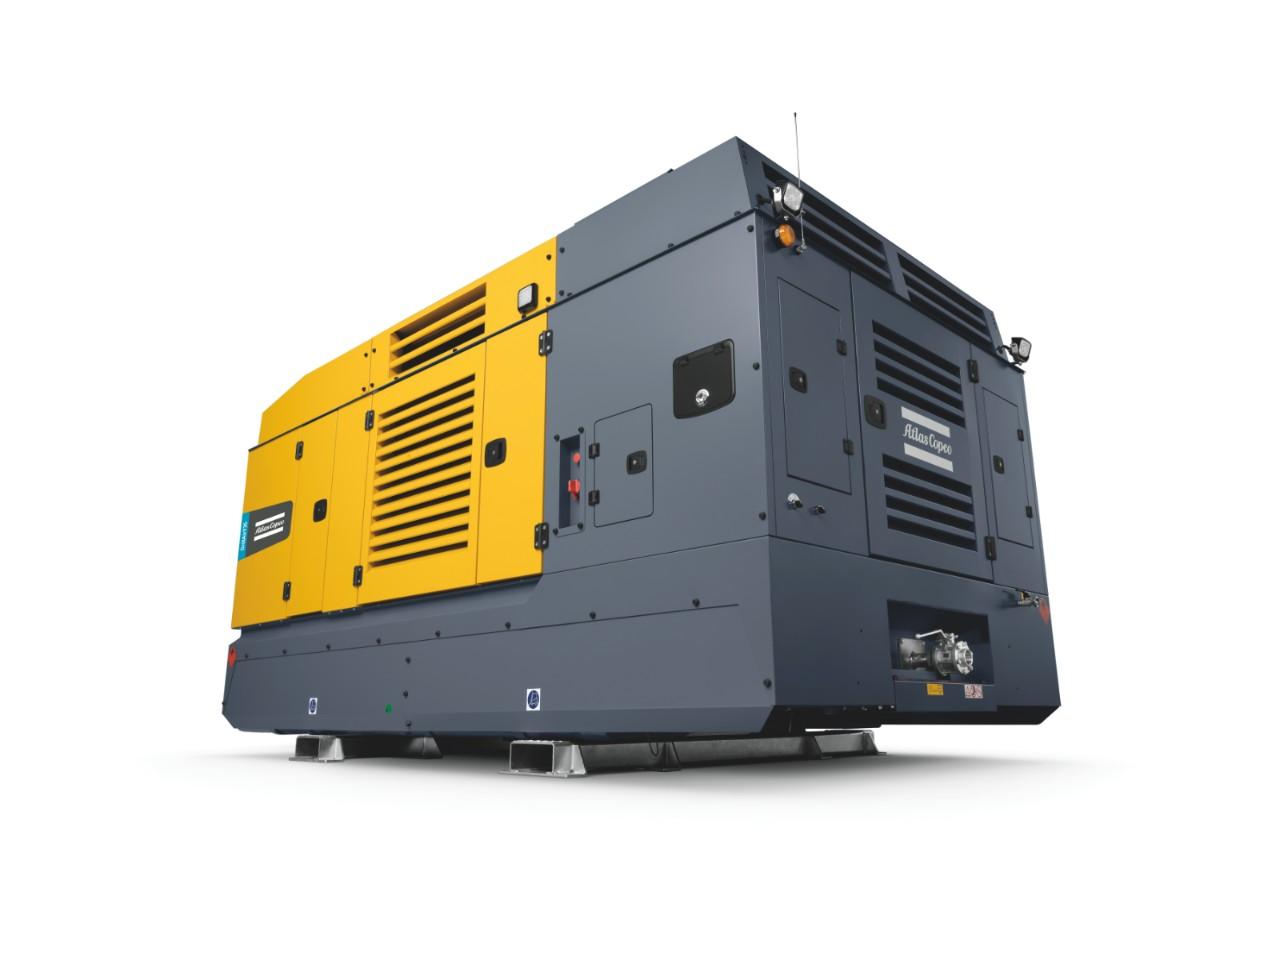 ATLAS COPCO - Location - Compresseur thermique à vis haute pression - Drillair Y35